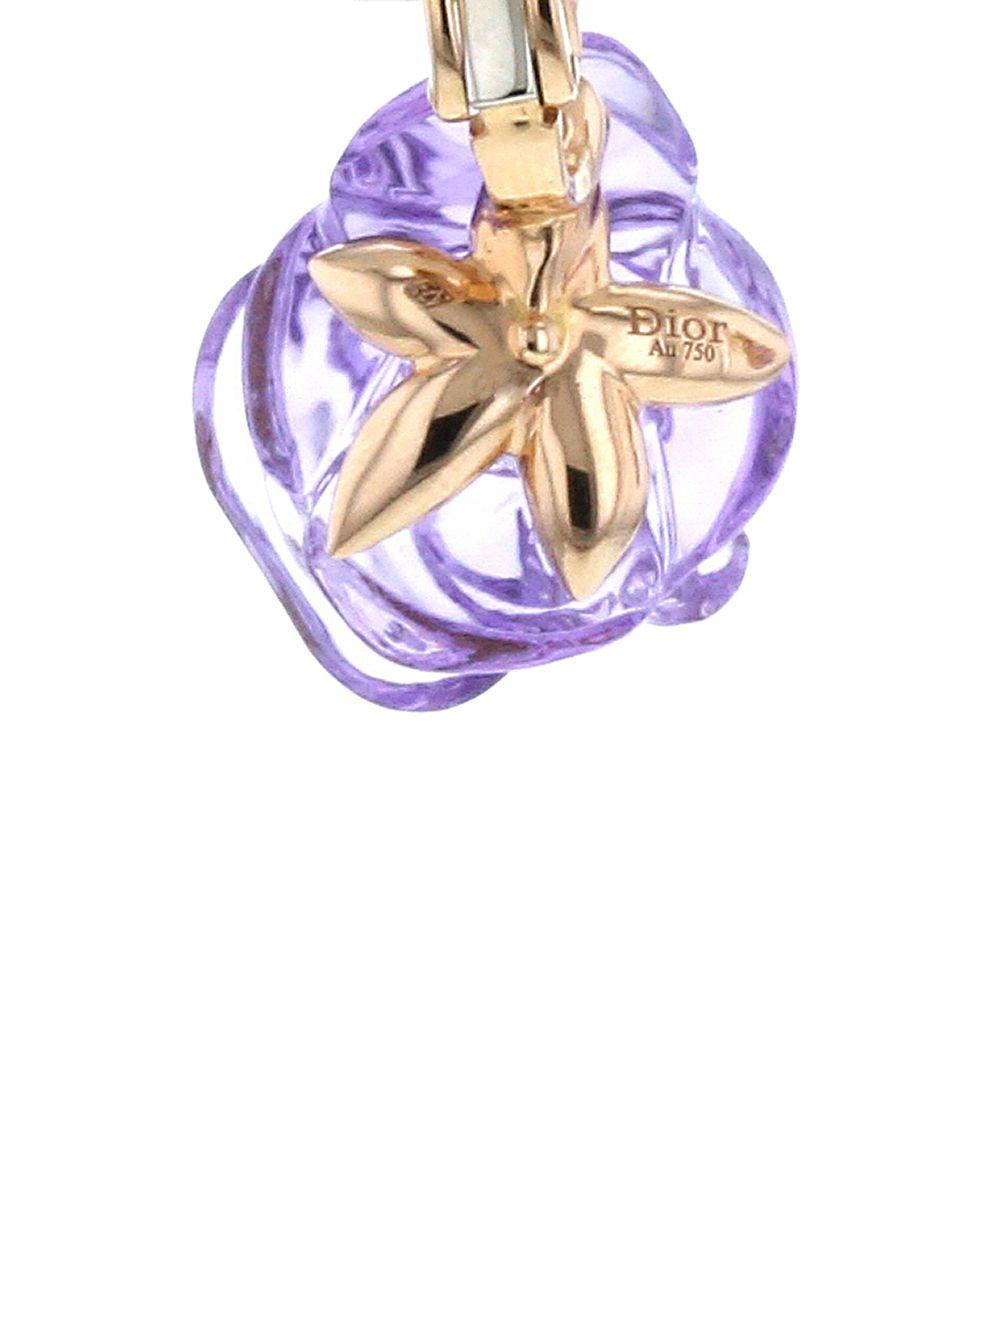 Dior | Christian Dior серьги Pre Catelan из розового золота с аметистами и бриллиантами pre-owned | Clouty